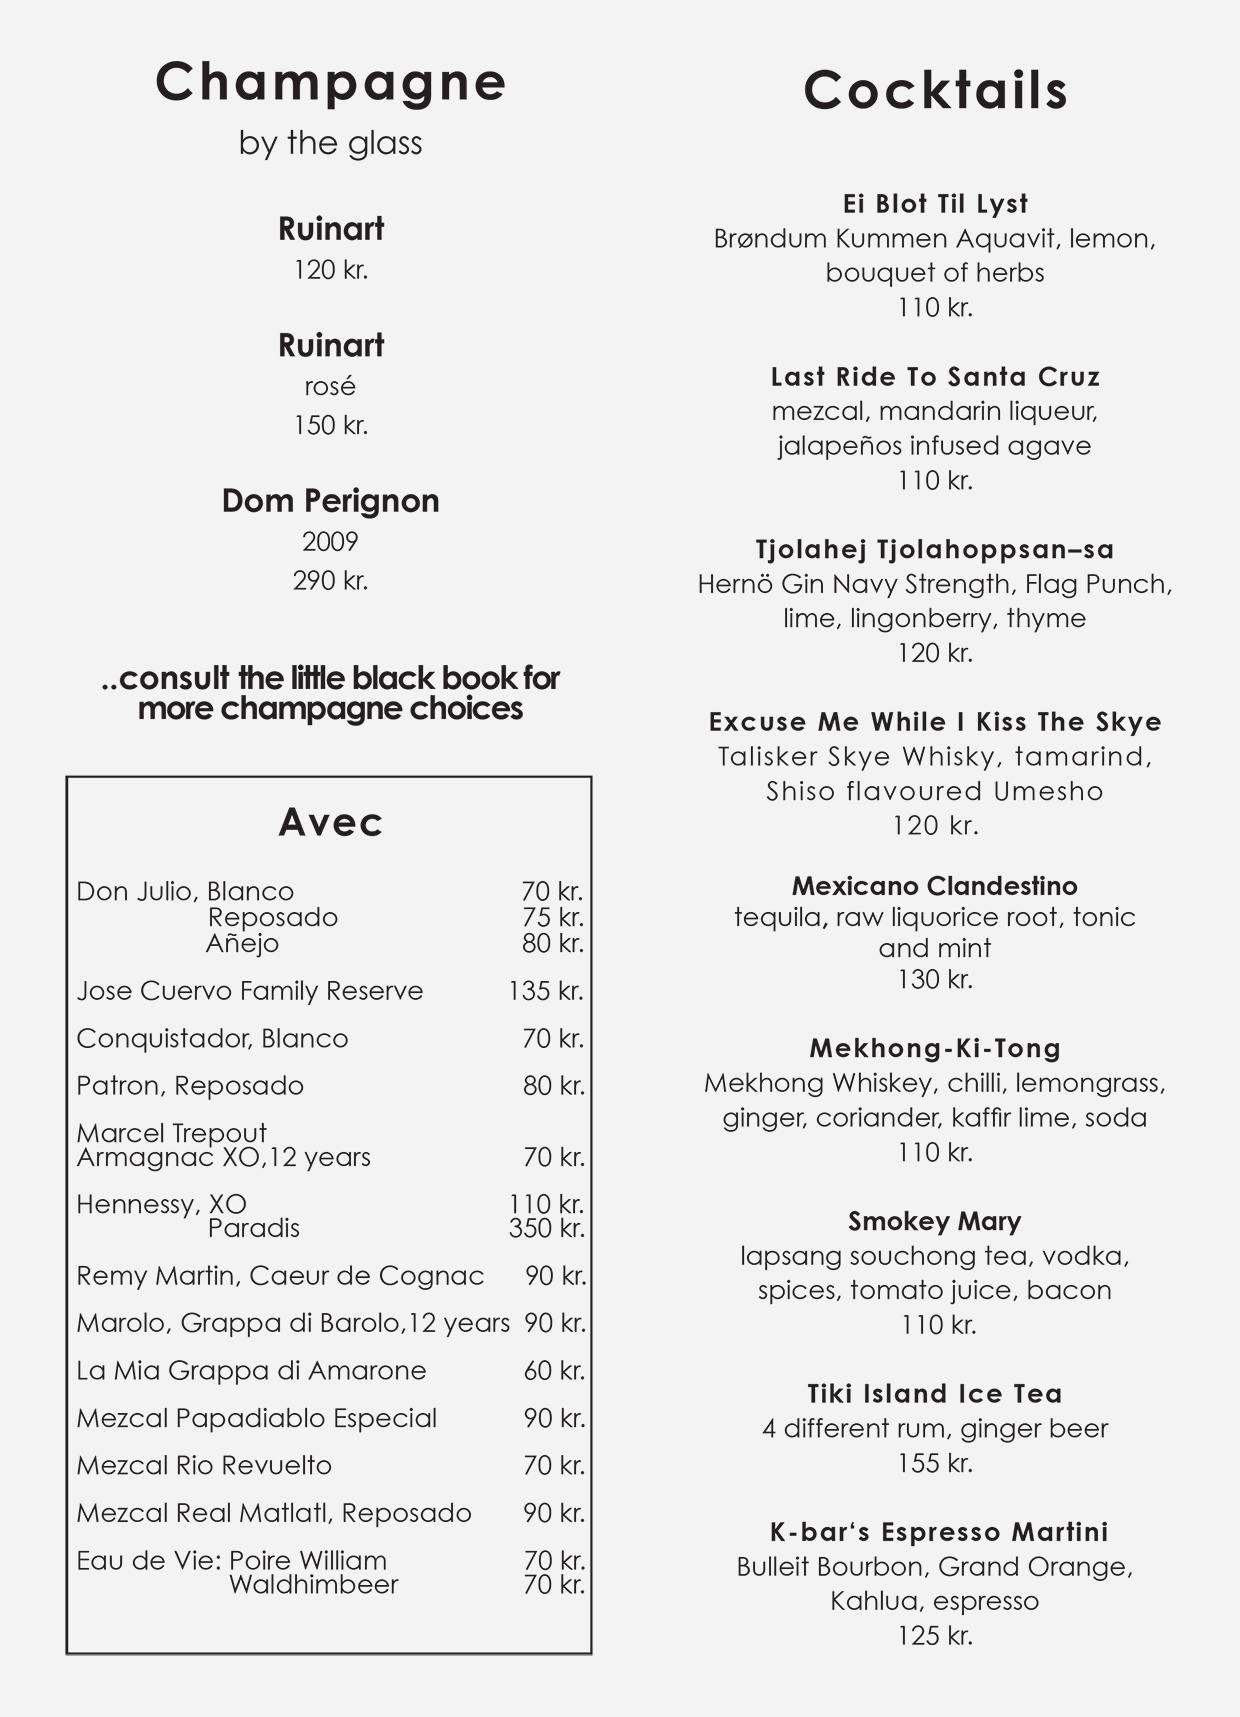 Kbar kocktailkort 20180820 3